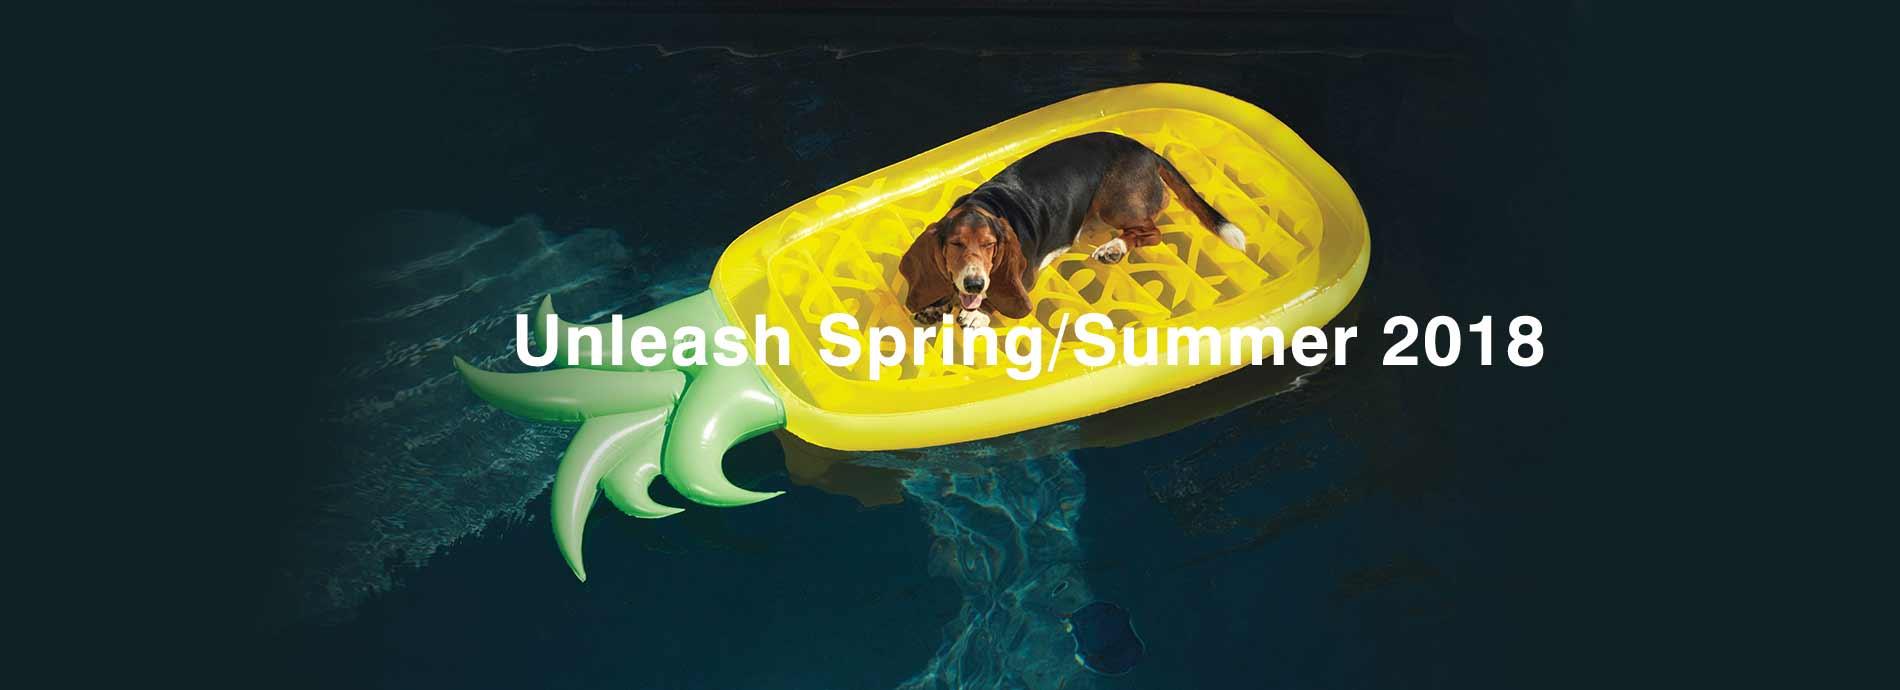 Unleash Spring / Summer 2018